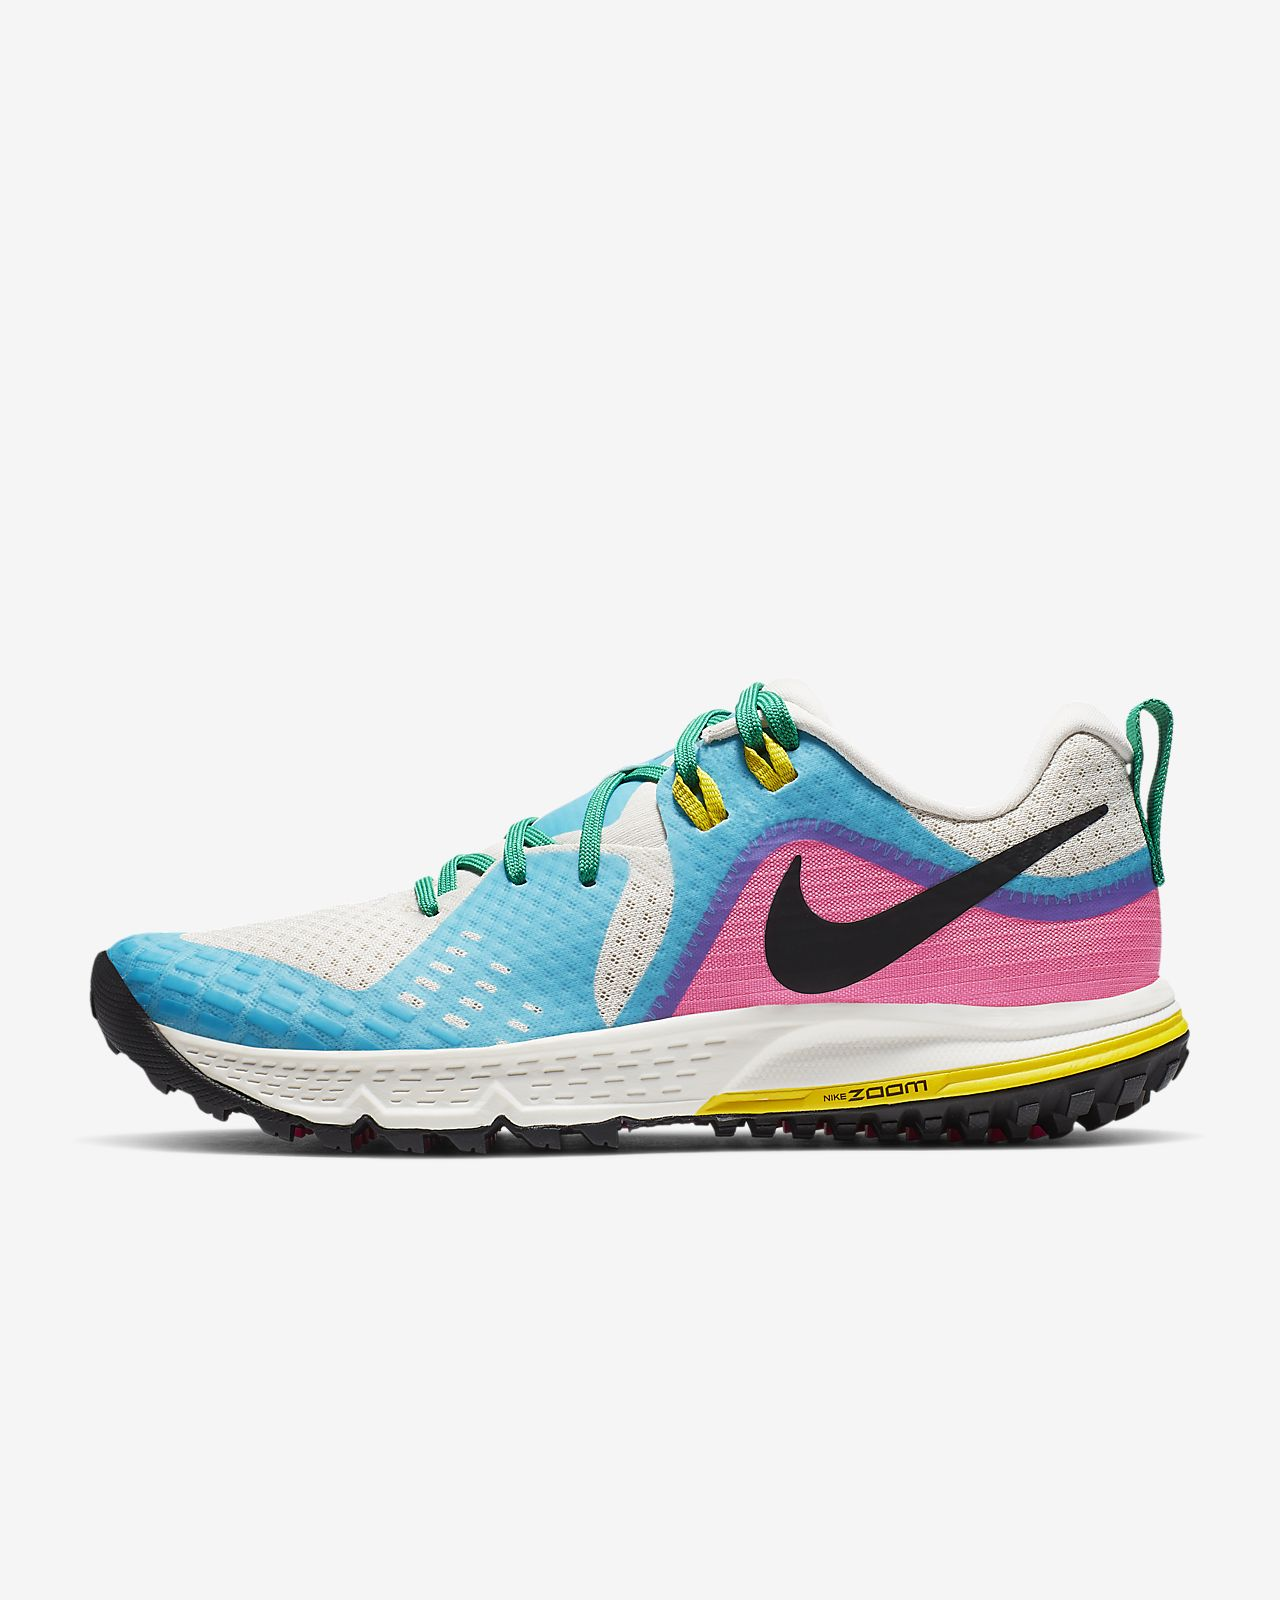 Nike Air Zoom Wildhorse 5 Women's Running Shoe